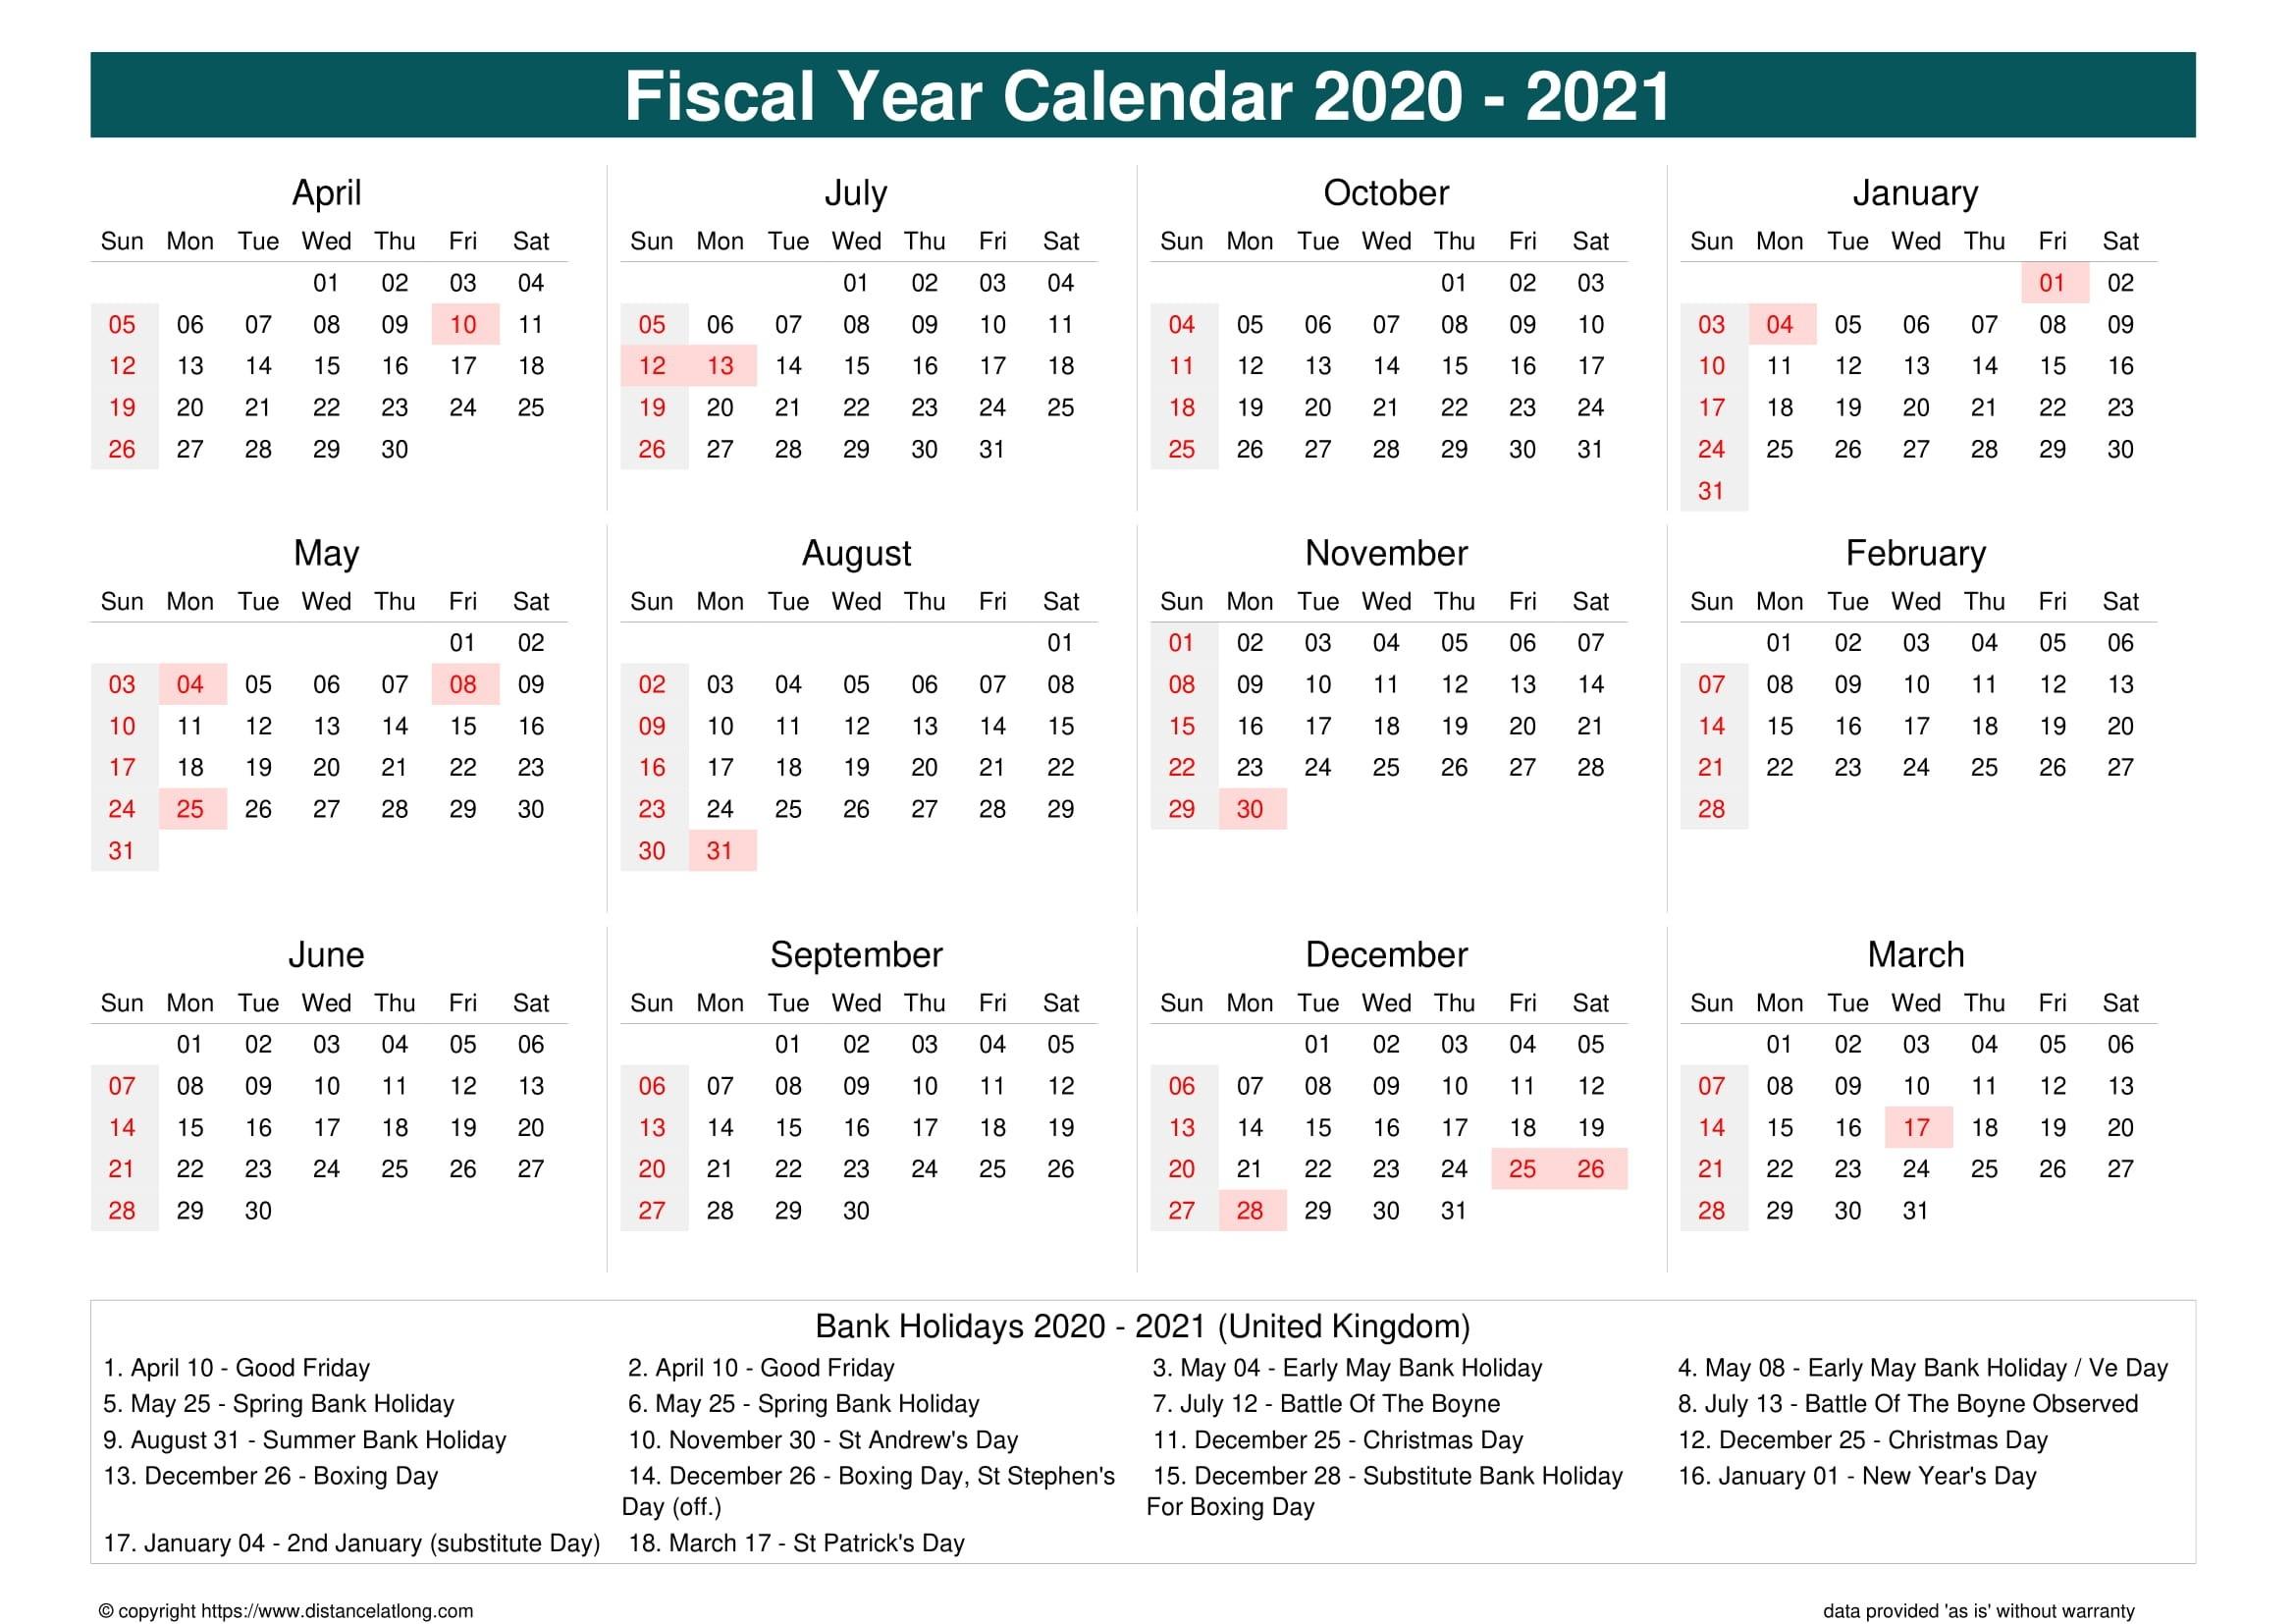 2019 Holiday Calendar Landscape Orientation Free Printable-Bank Holidays Calendar 2021